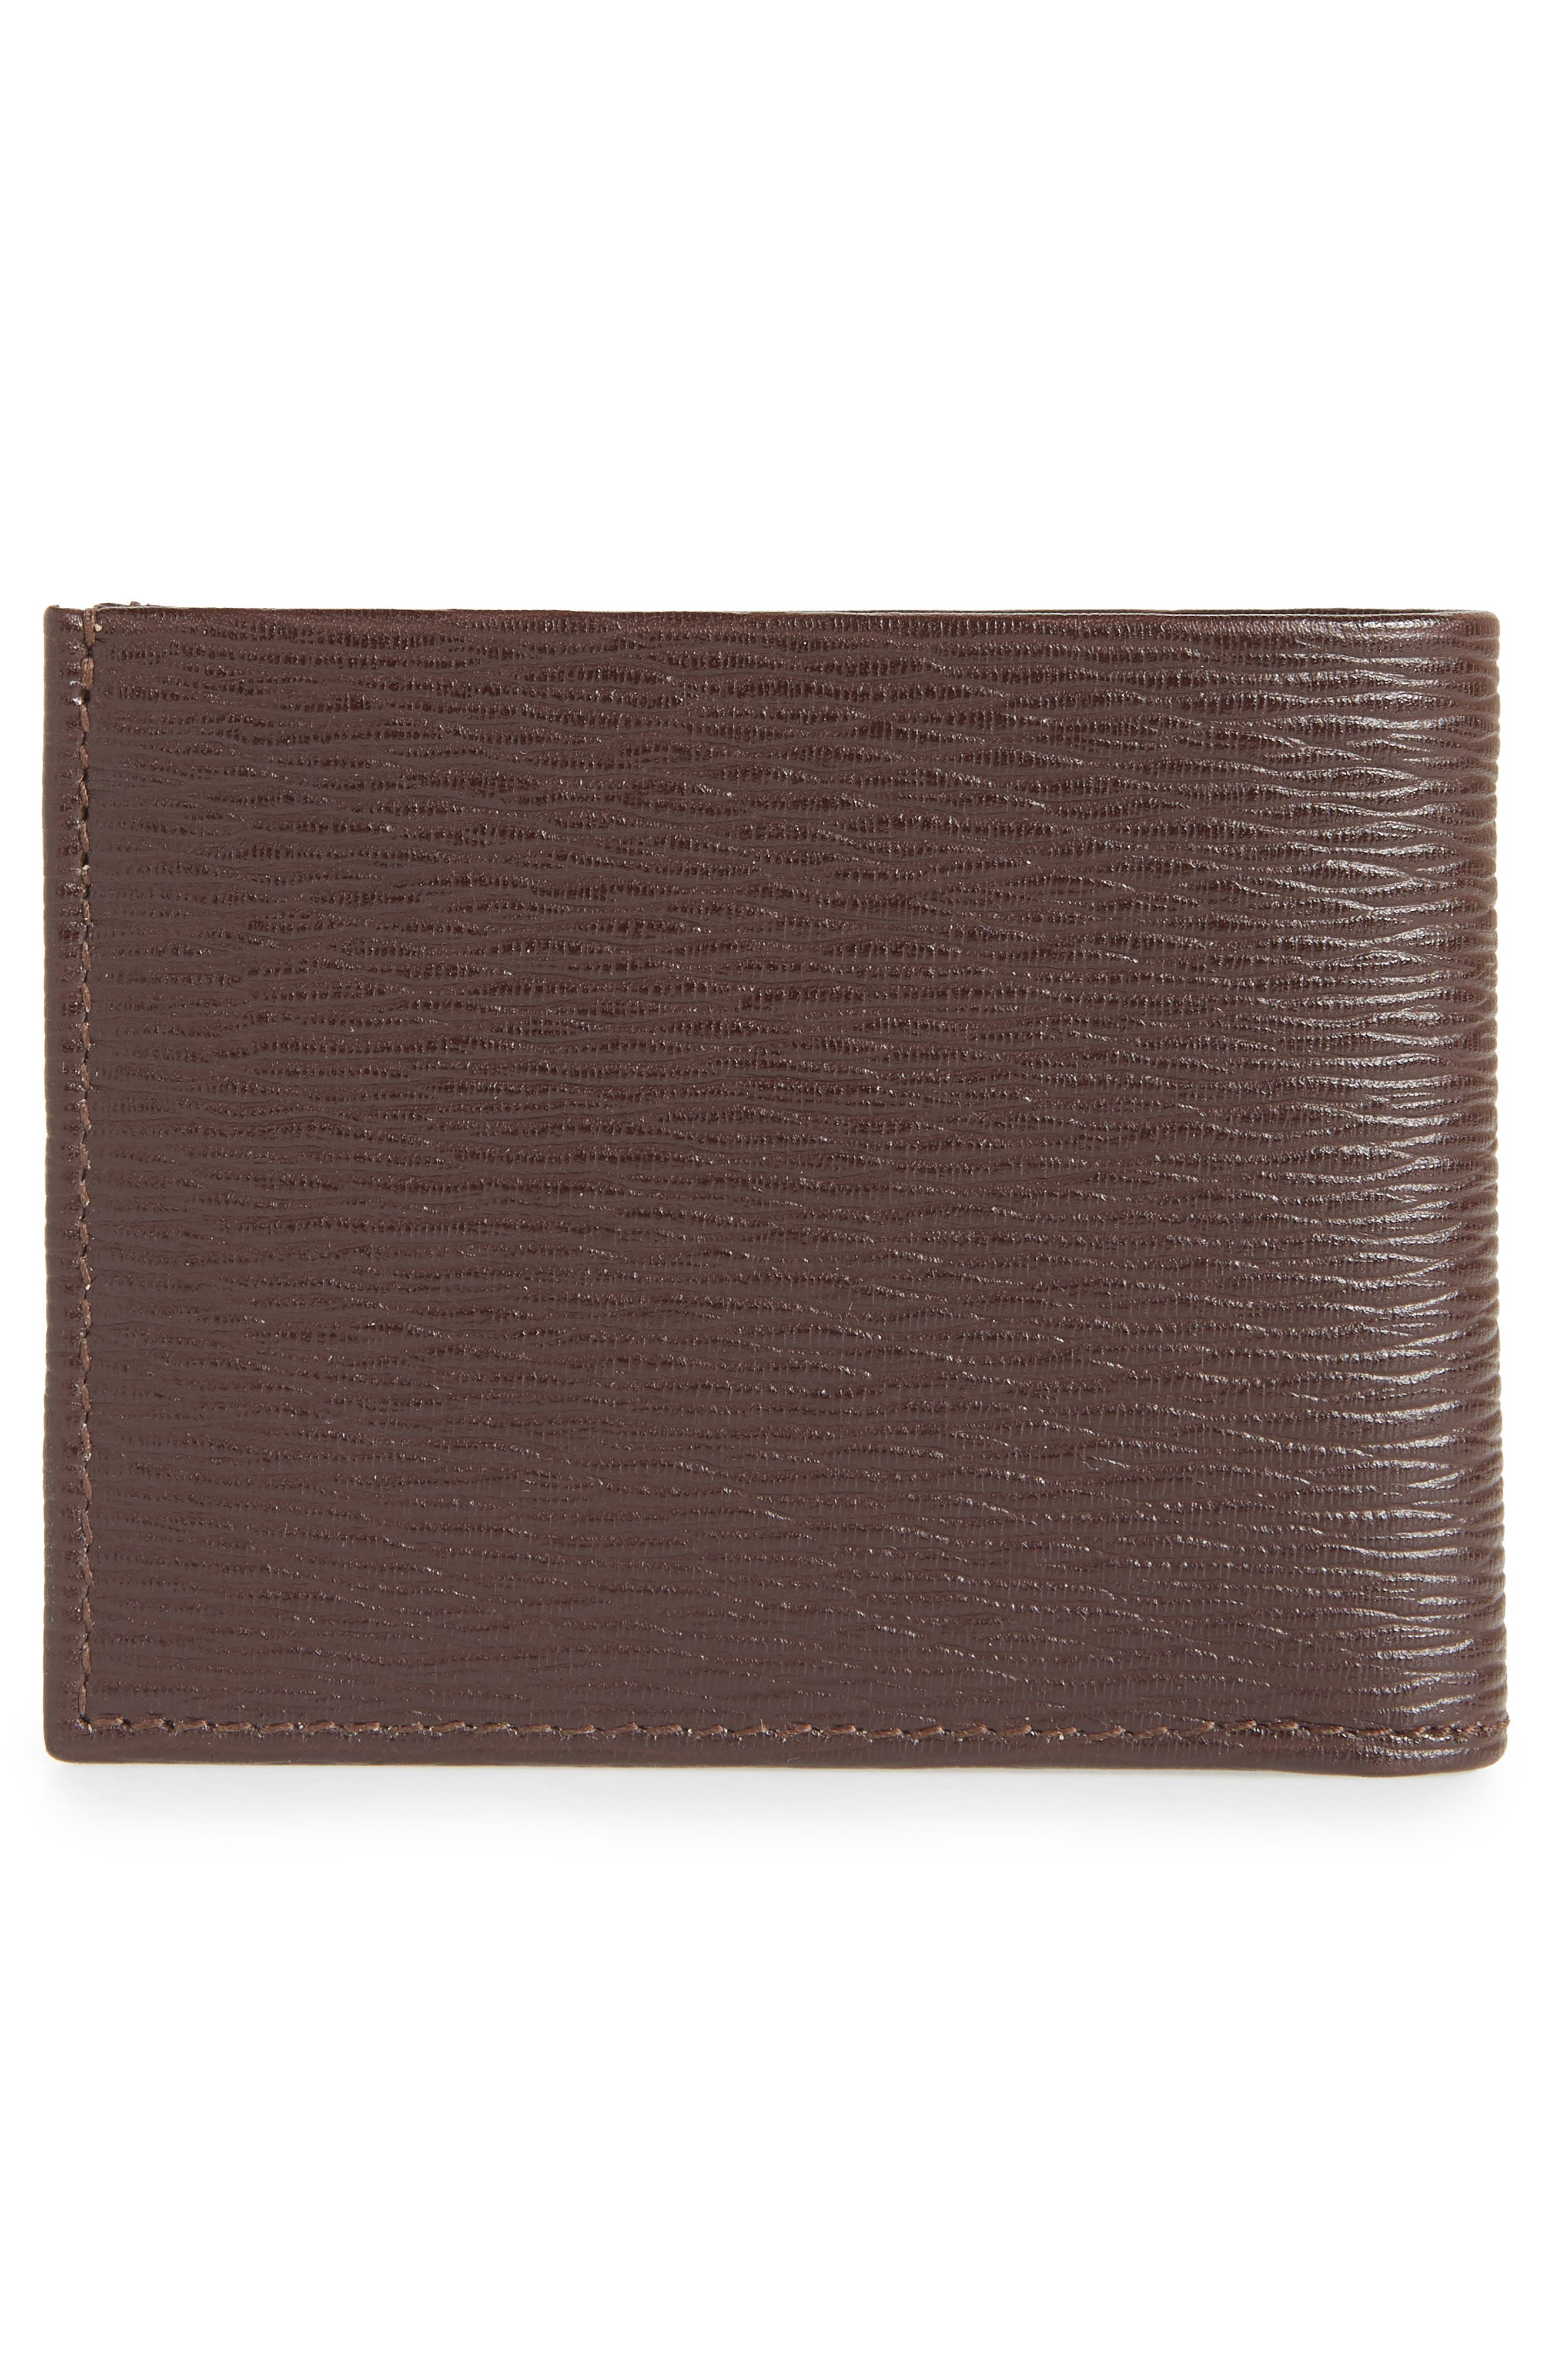 Revival Gancio Bifold Leather Wallet,                             Alternate thumbnail 3, color,                             TOBACCO